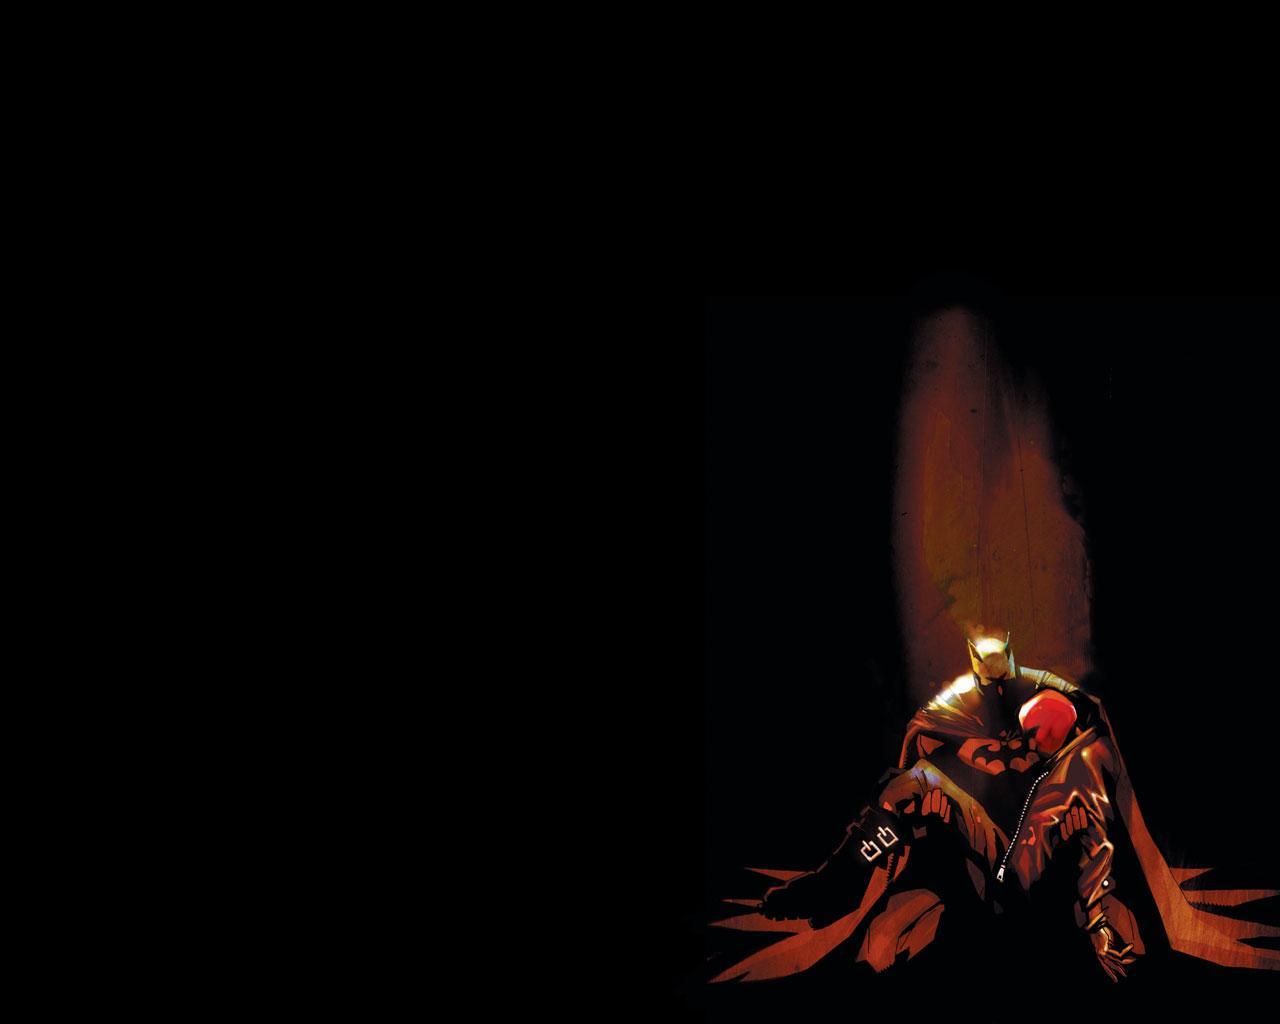 Batman Dark artistic HD Wallpaper